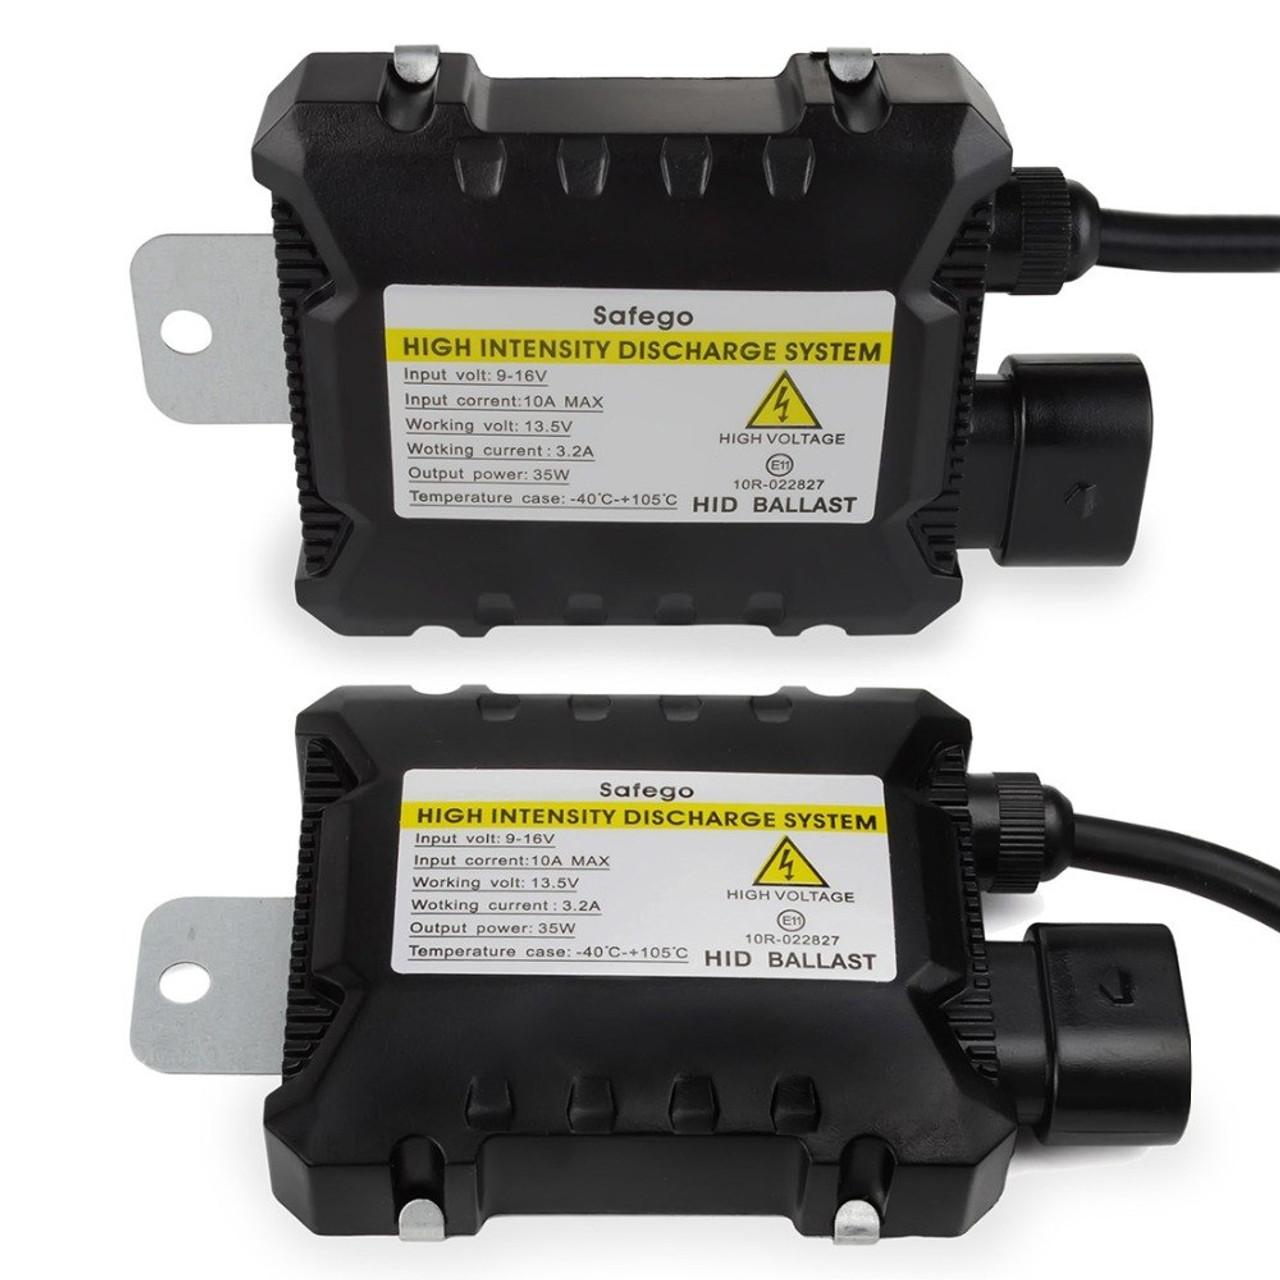 Xenon 35w HID Kit 9006 9005 H11 9007 9004 H4 9003 H7 Headlight High Low Beam Kit